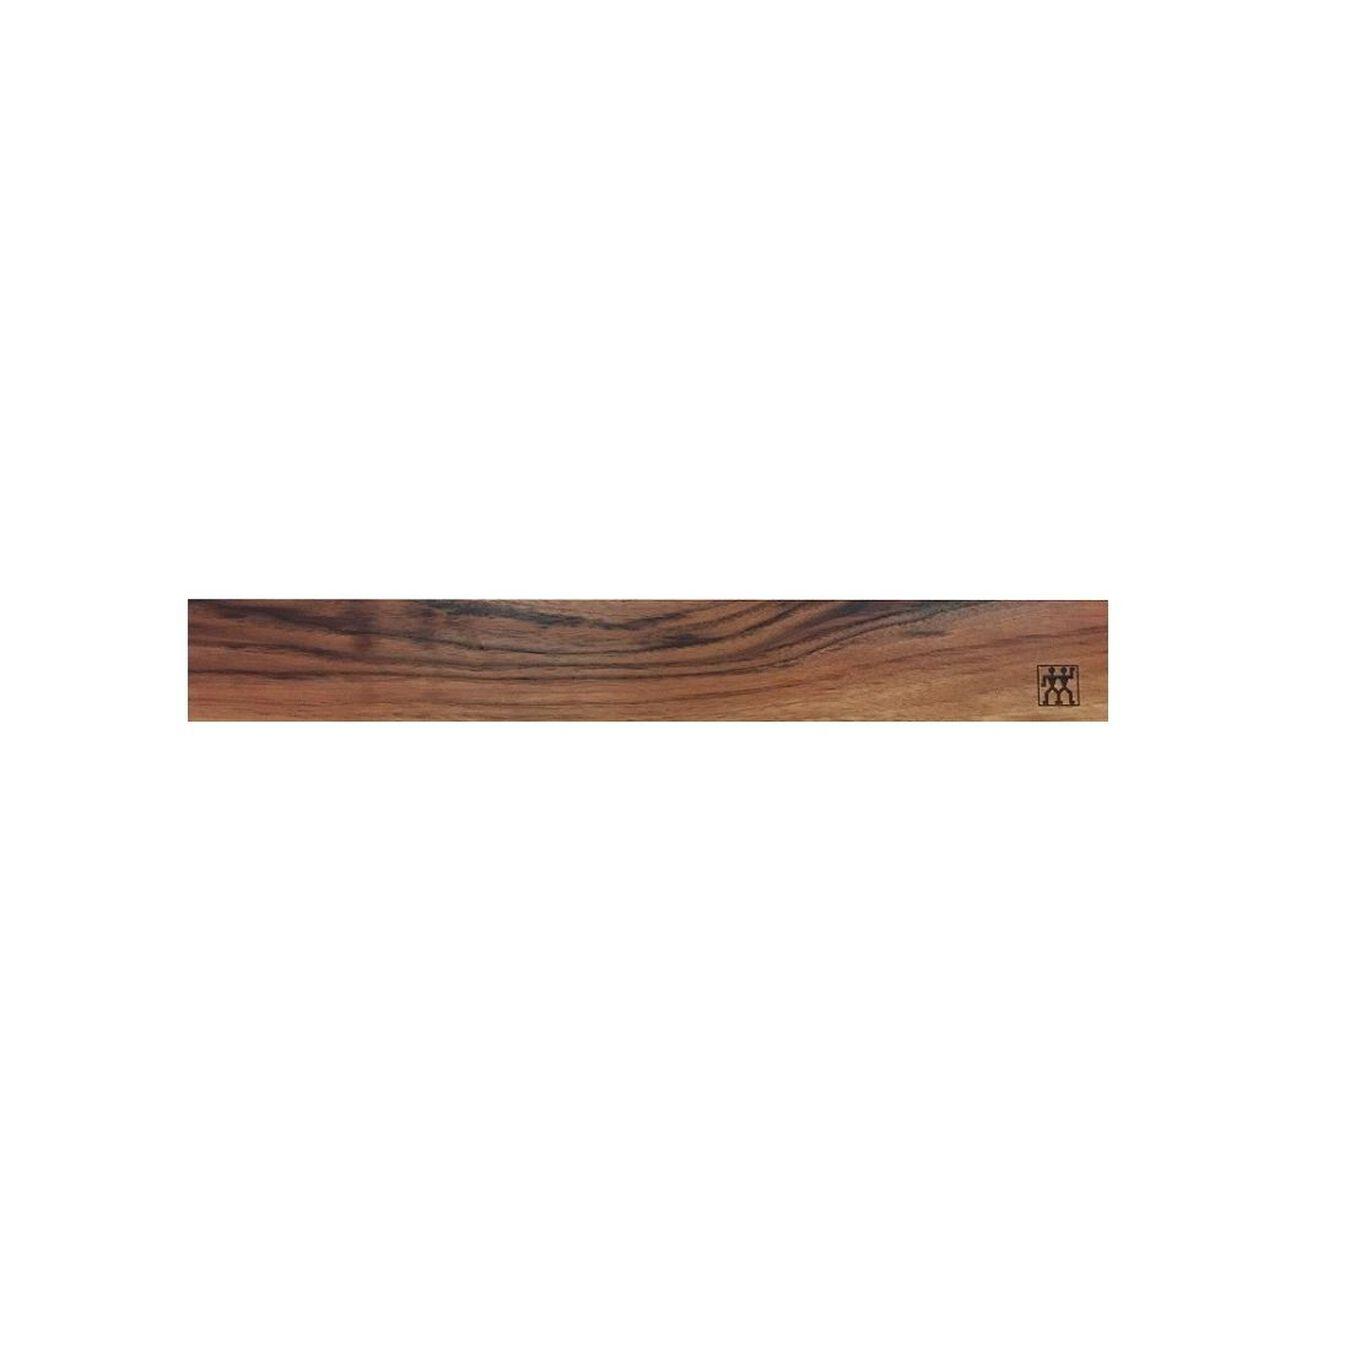 18-inch, Walnut, Magnetic knife bar, brown,,large 1